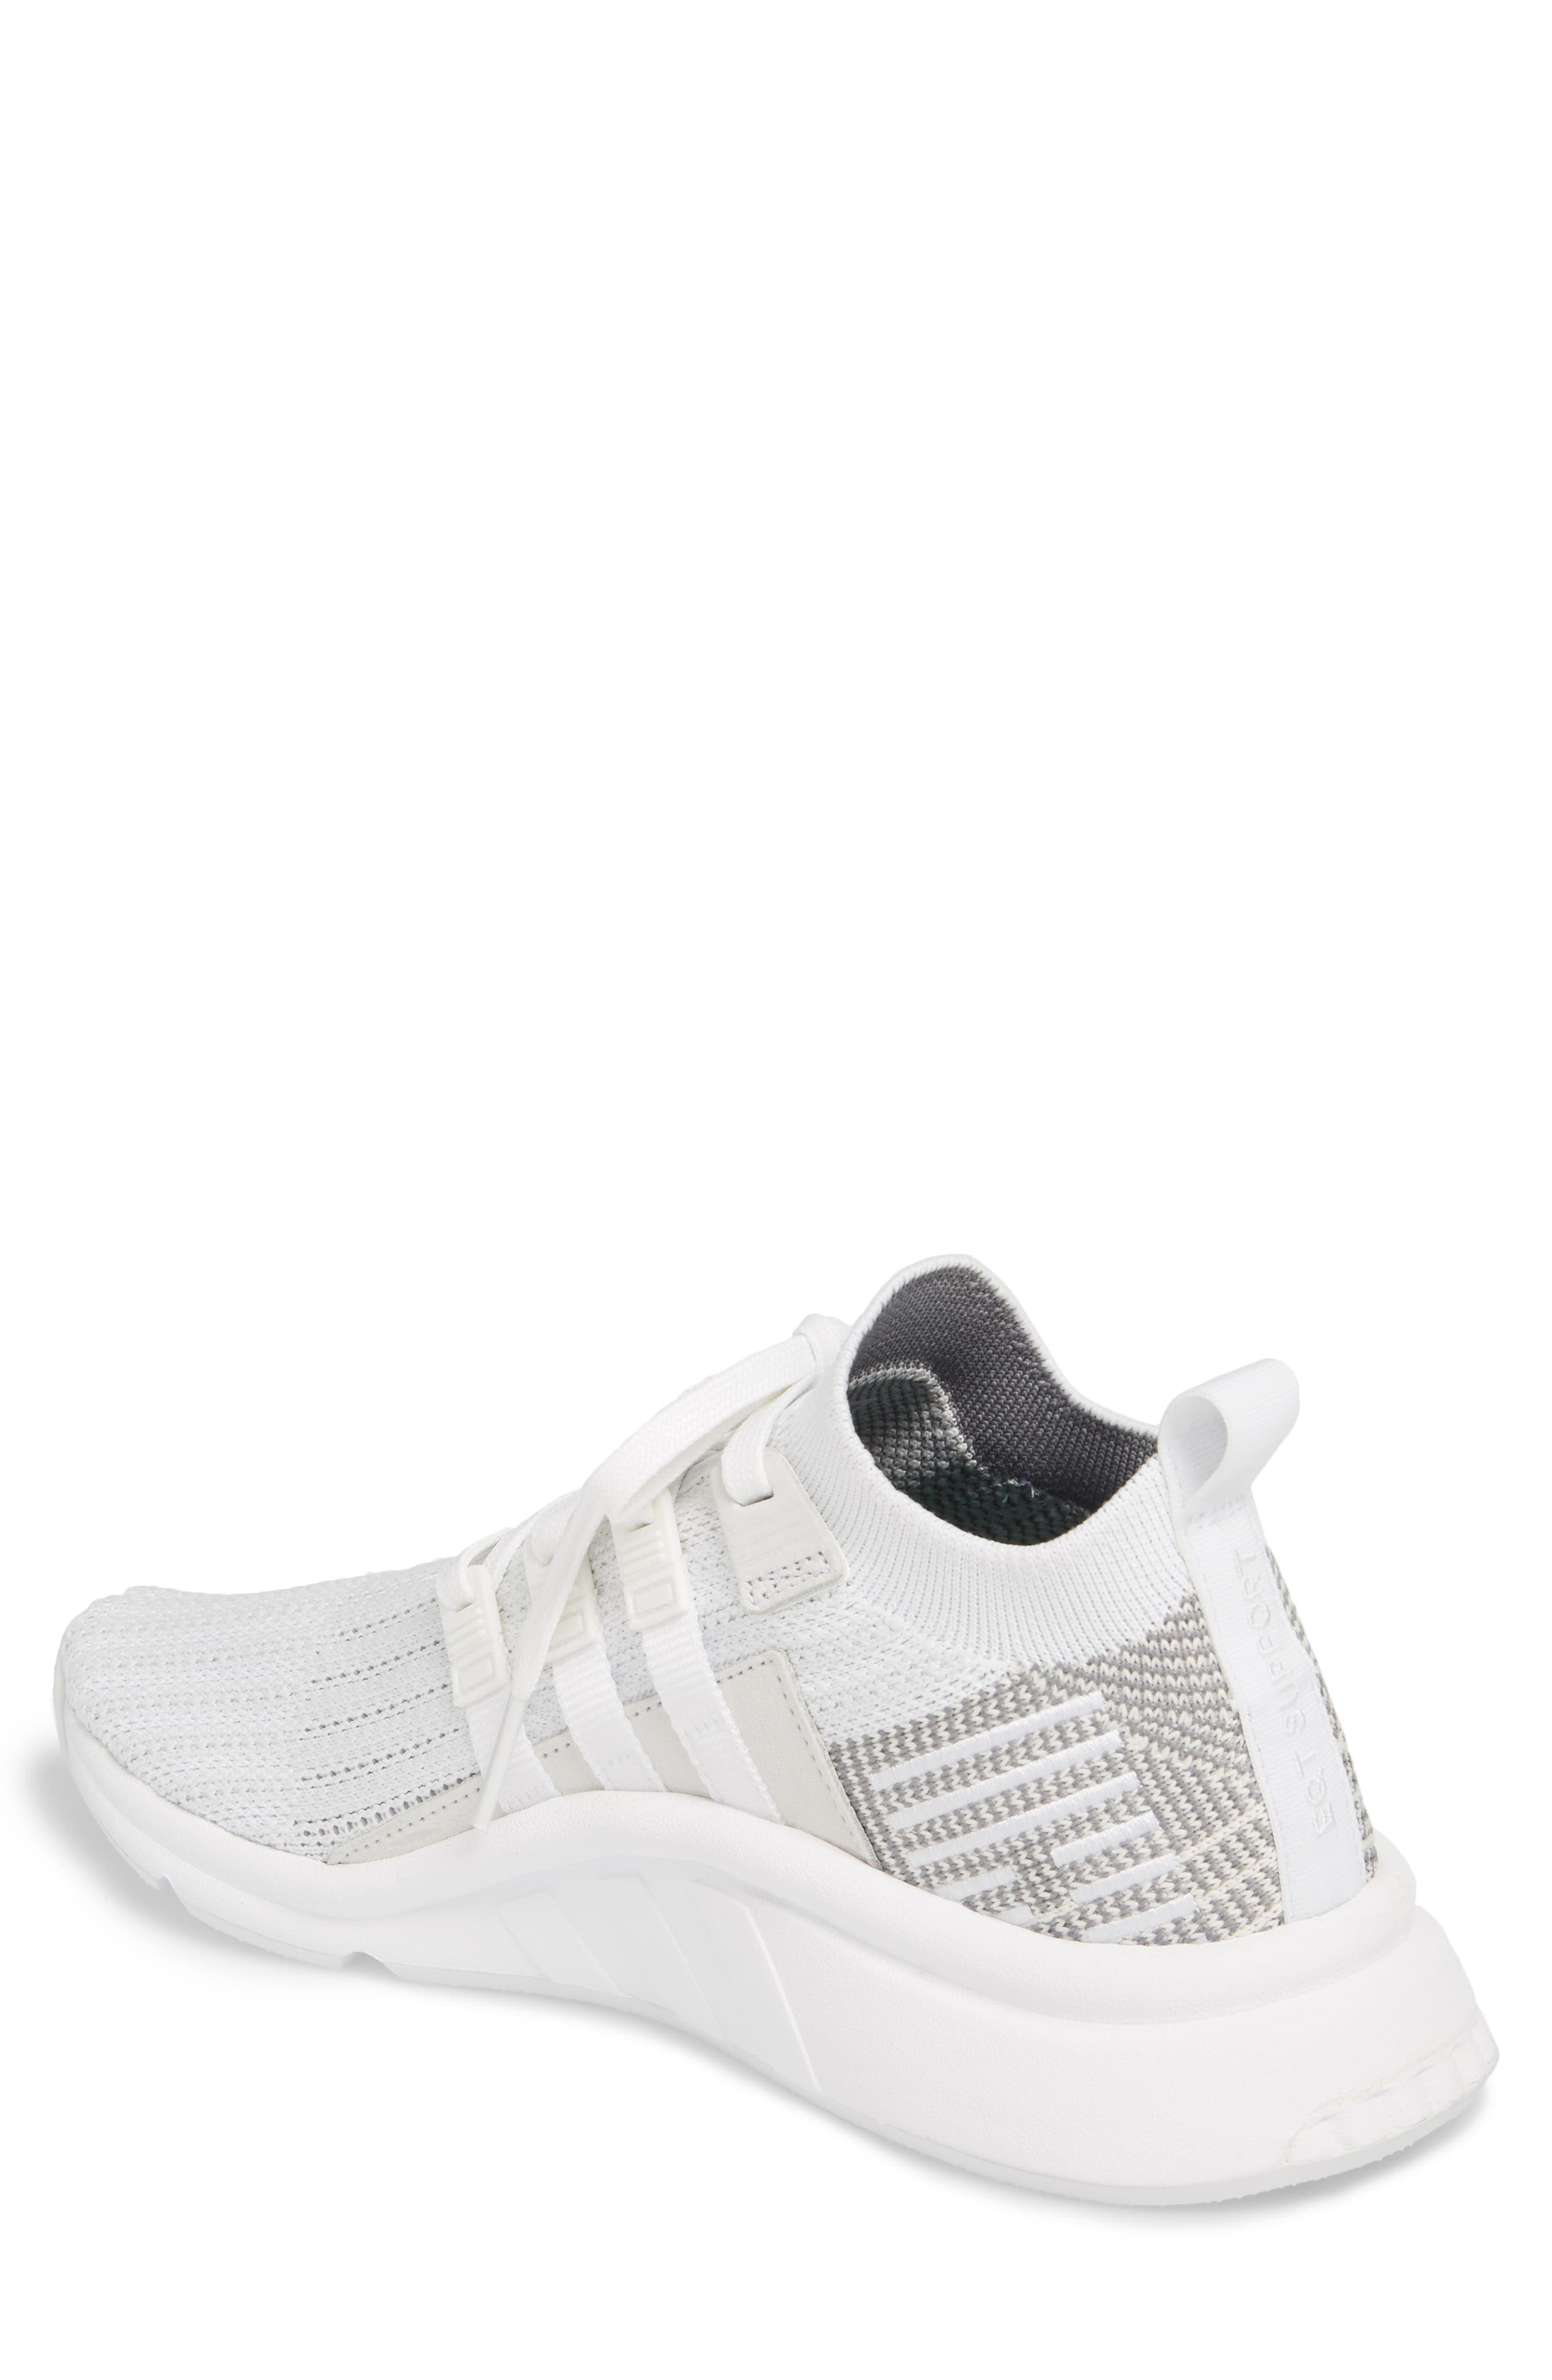 EQT Support Mid ADV Primeknit Sneaker,                             Alternate thumbnail 2, color,                             WHITE/ WHITE/ GREY